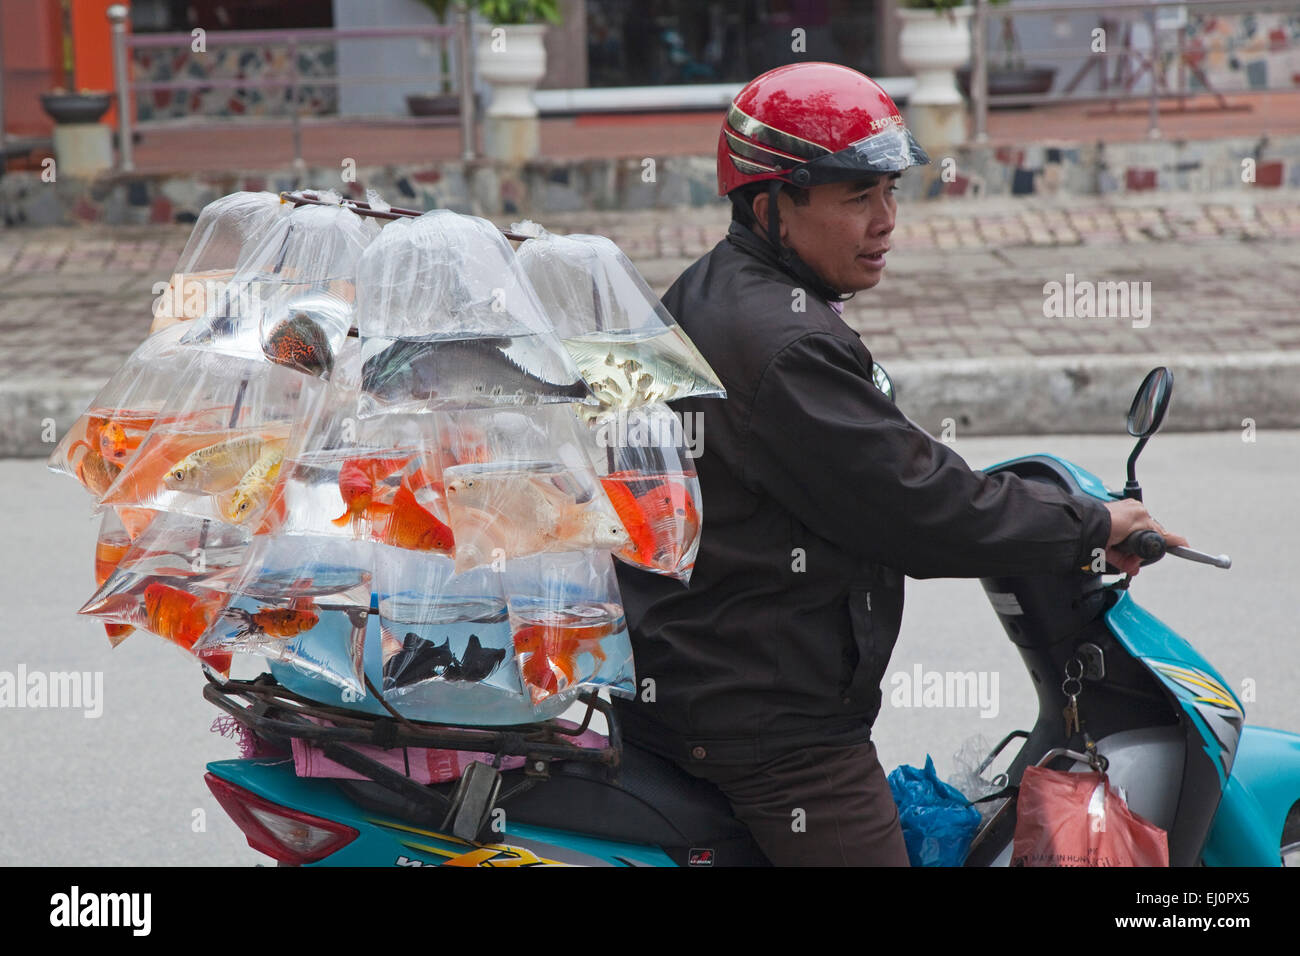 Ha Long, Hong Gai, Hon Gai, Hongay, Quang Ninh Province, Vietnam, SE Asia, South East Asia, mobile, scooter, vendor, Stock Photo